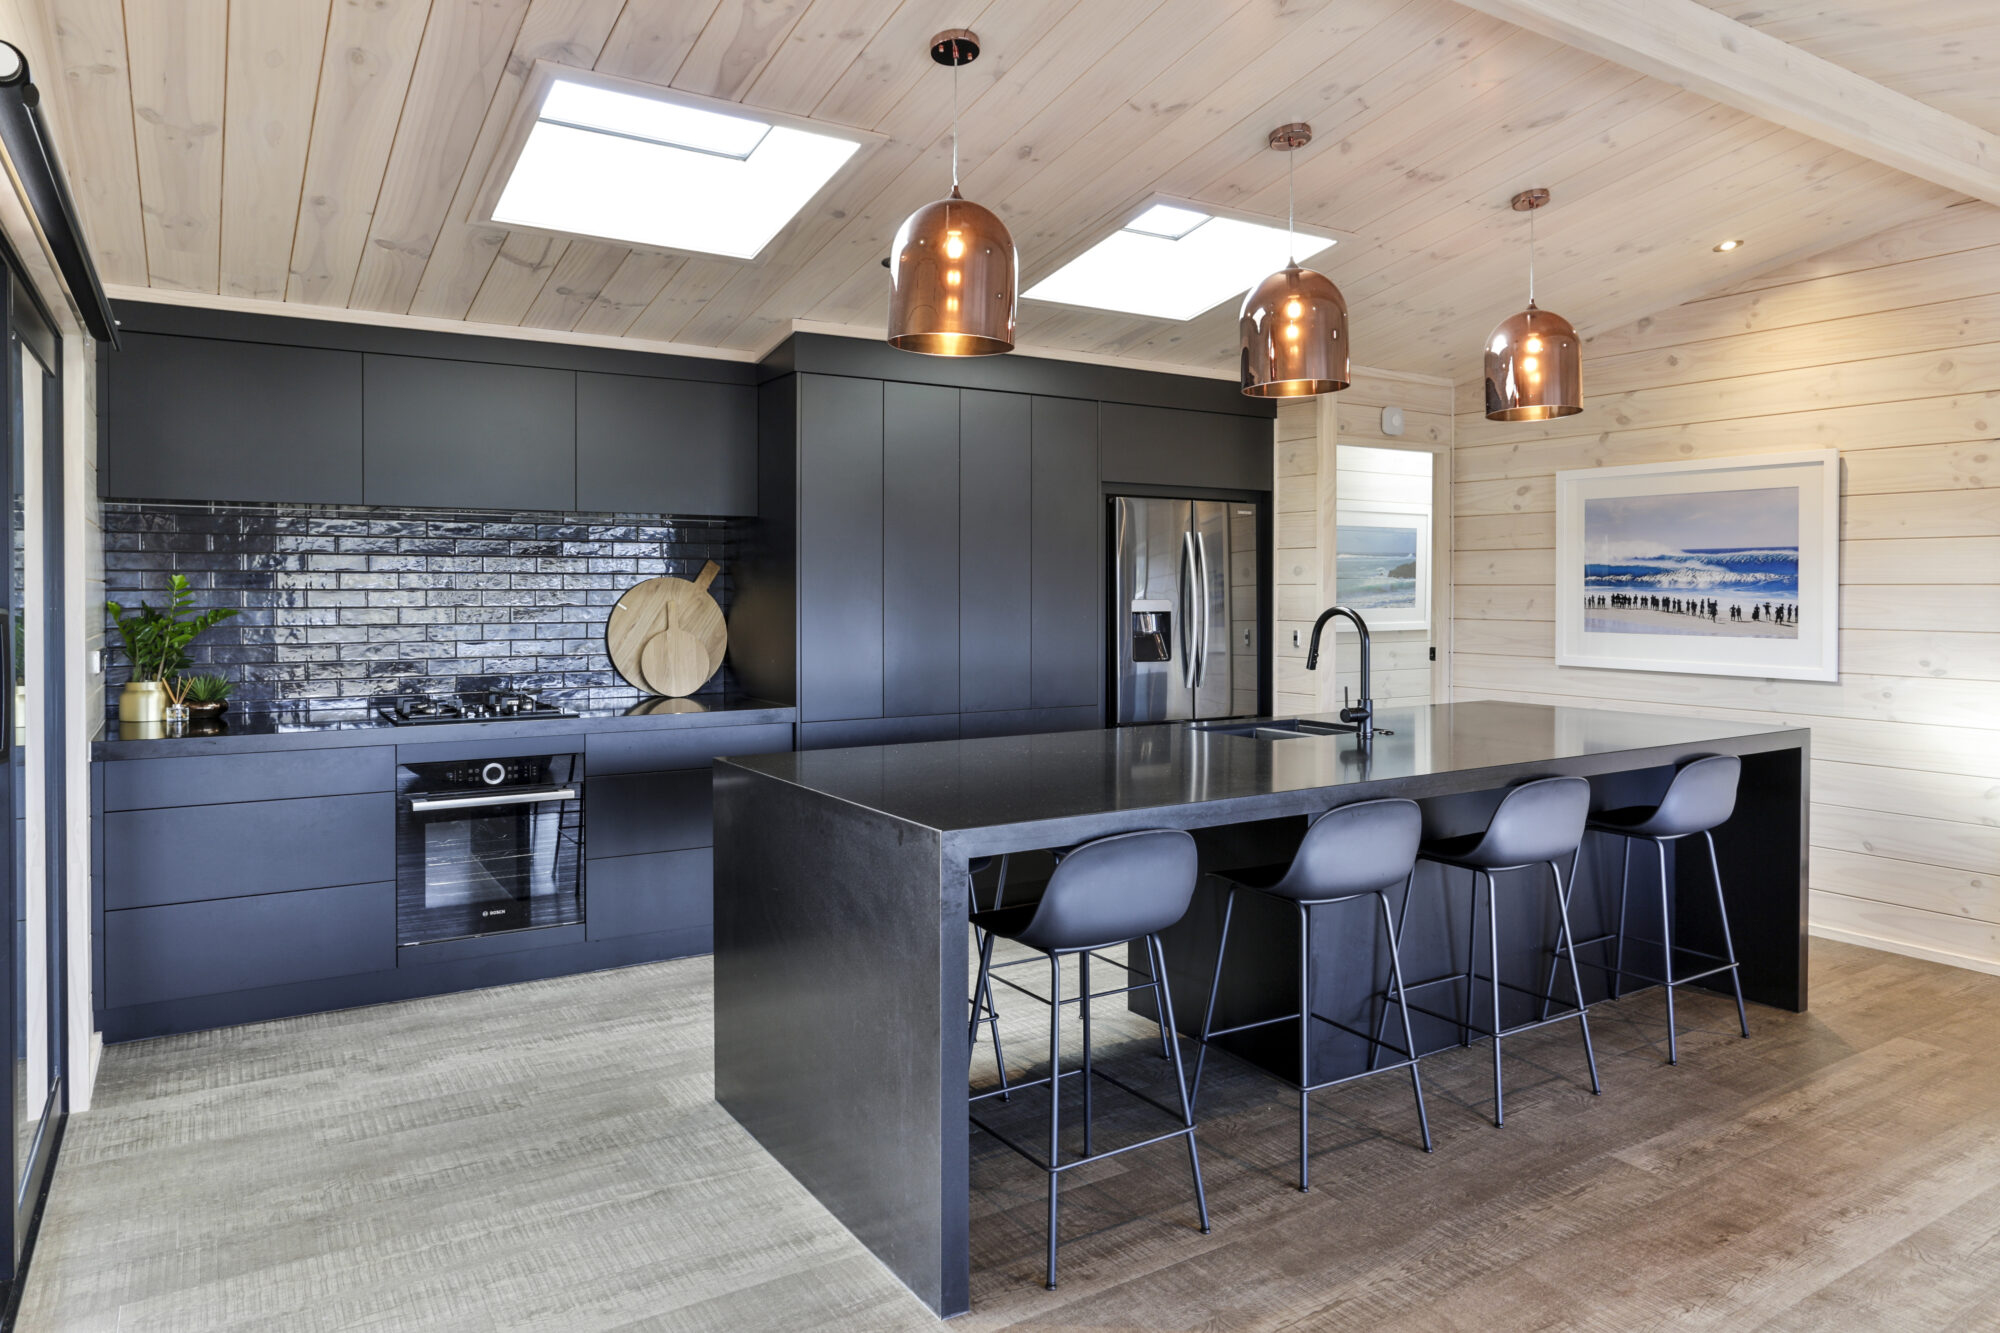 All black Lockwood kitchen